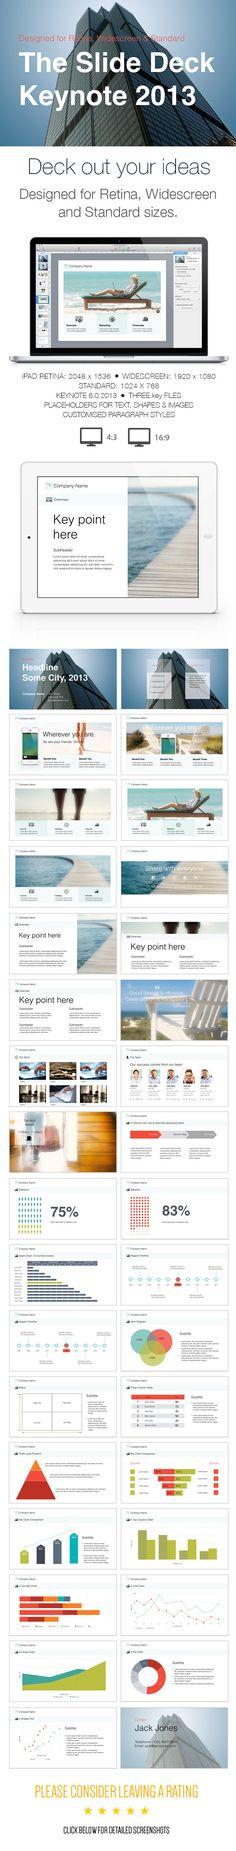 The Slide Deck- A Keynote Template #keynote #keynotetemplate Download: http://graphicriver.net/item/the-slide-deck-a-keynote-template/6082804?ref=ksioks